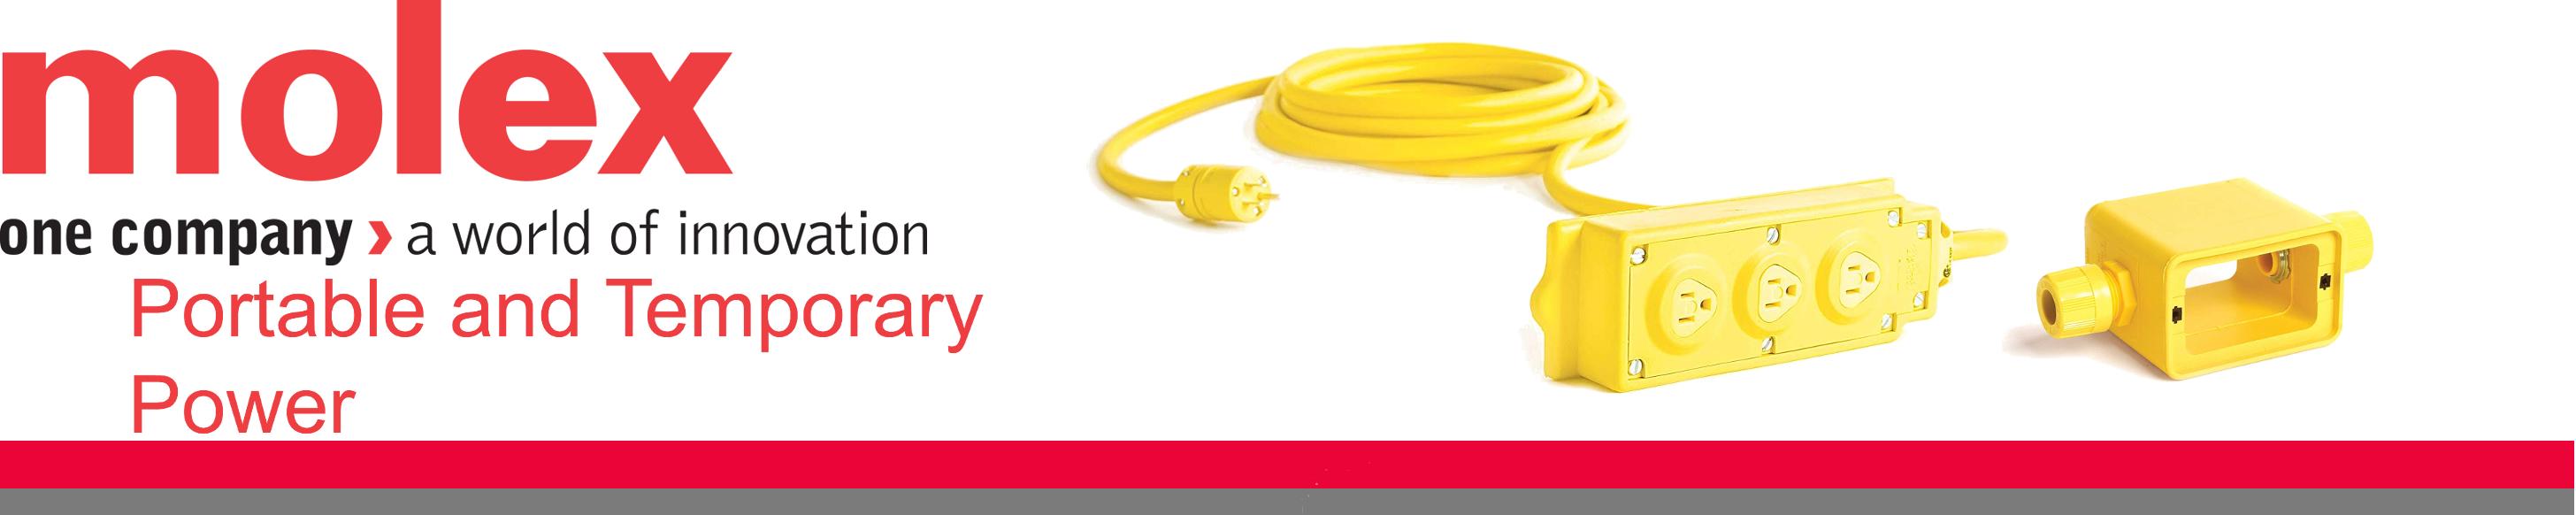 Flip Lid 25ft Cord Length Molex 12//3 SOOW Cord Type Woodhead 3330RA123 Super-Safeway Angled Outlet Box NEMA 5-15 Configuration